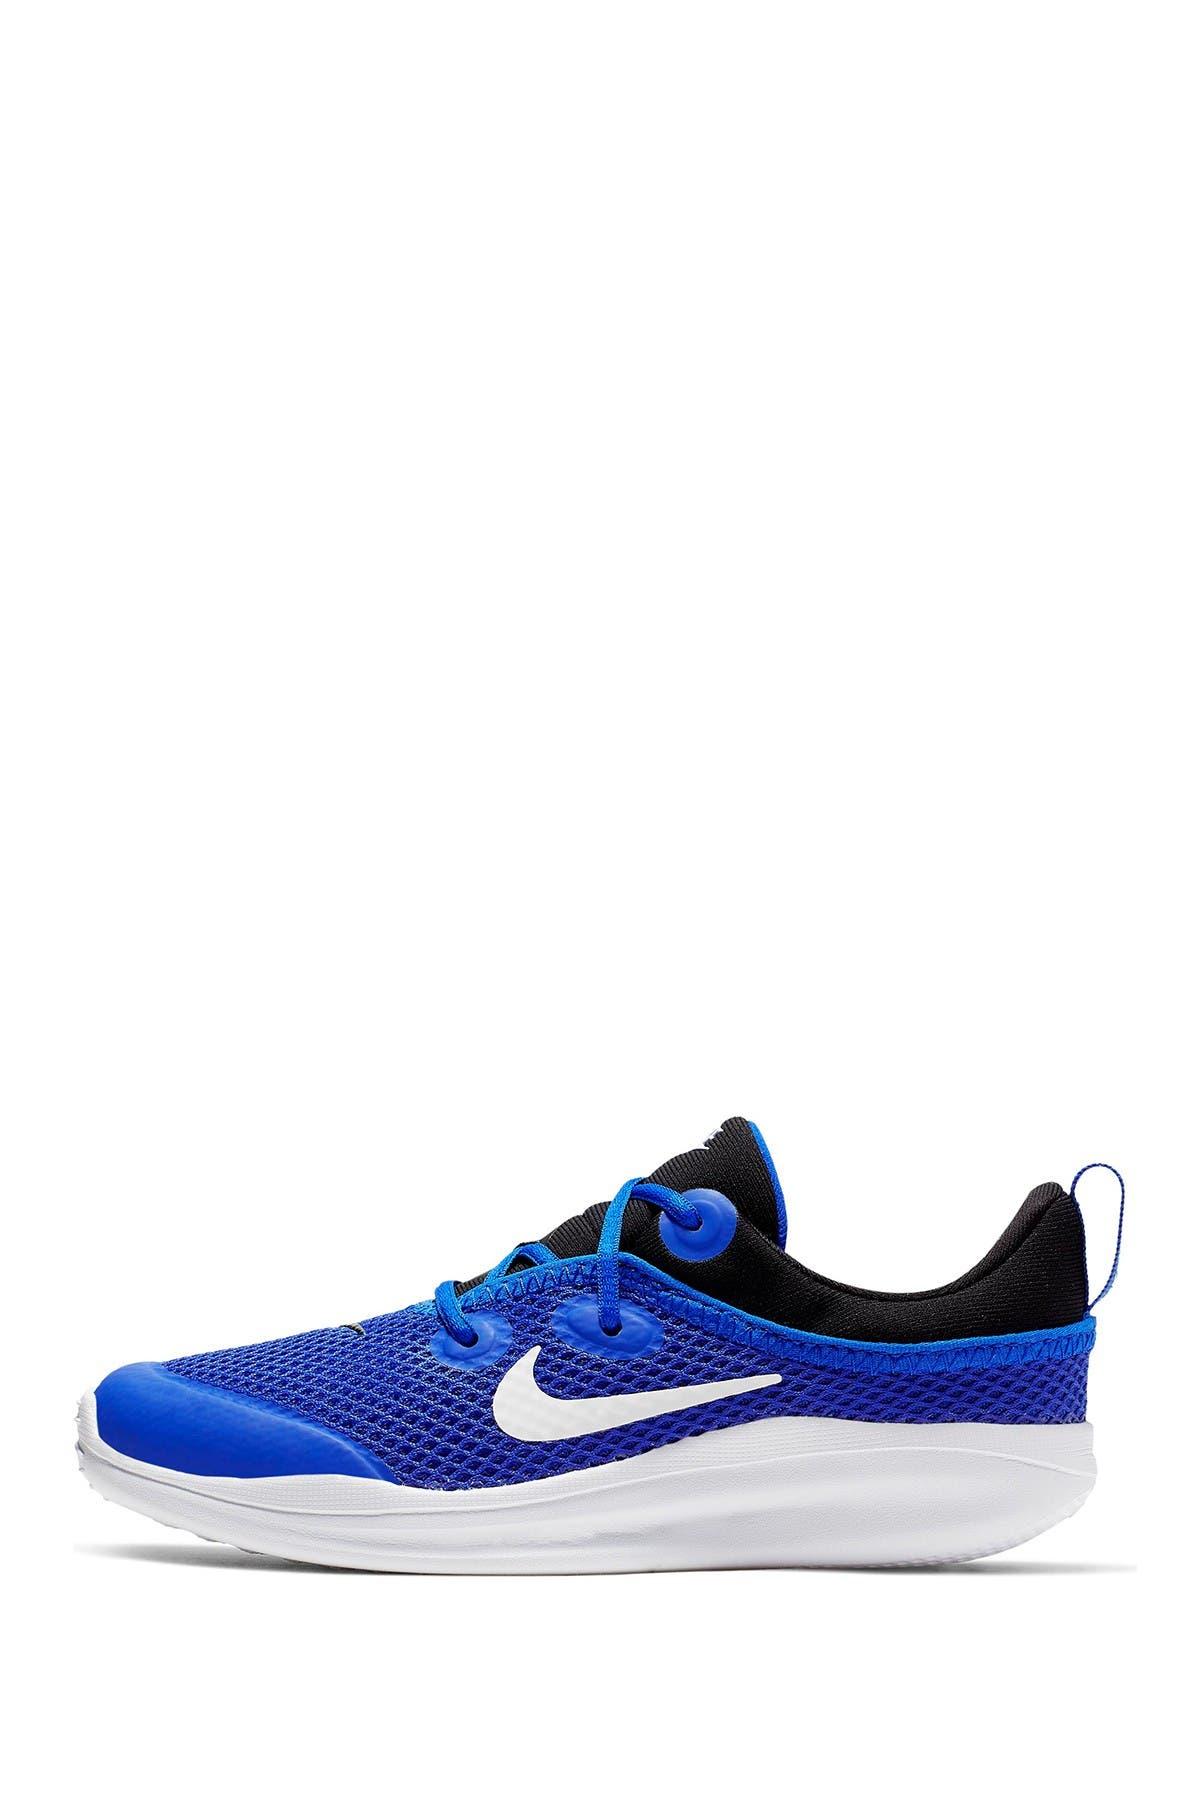 Nike   Acmi Sneaker   Nordstrom Rack